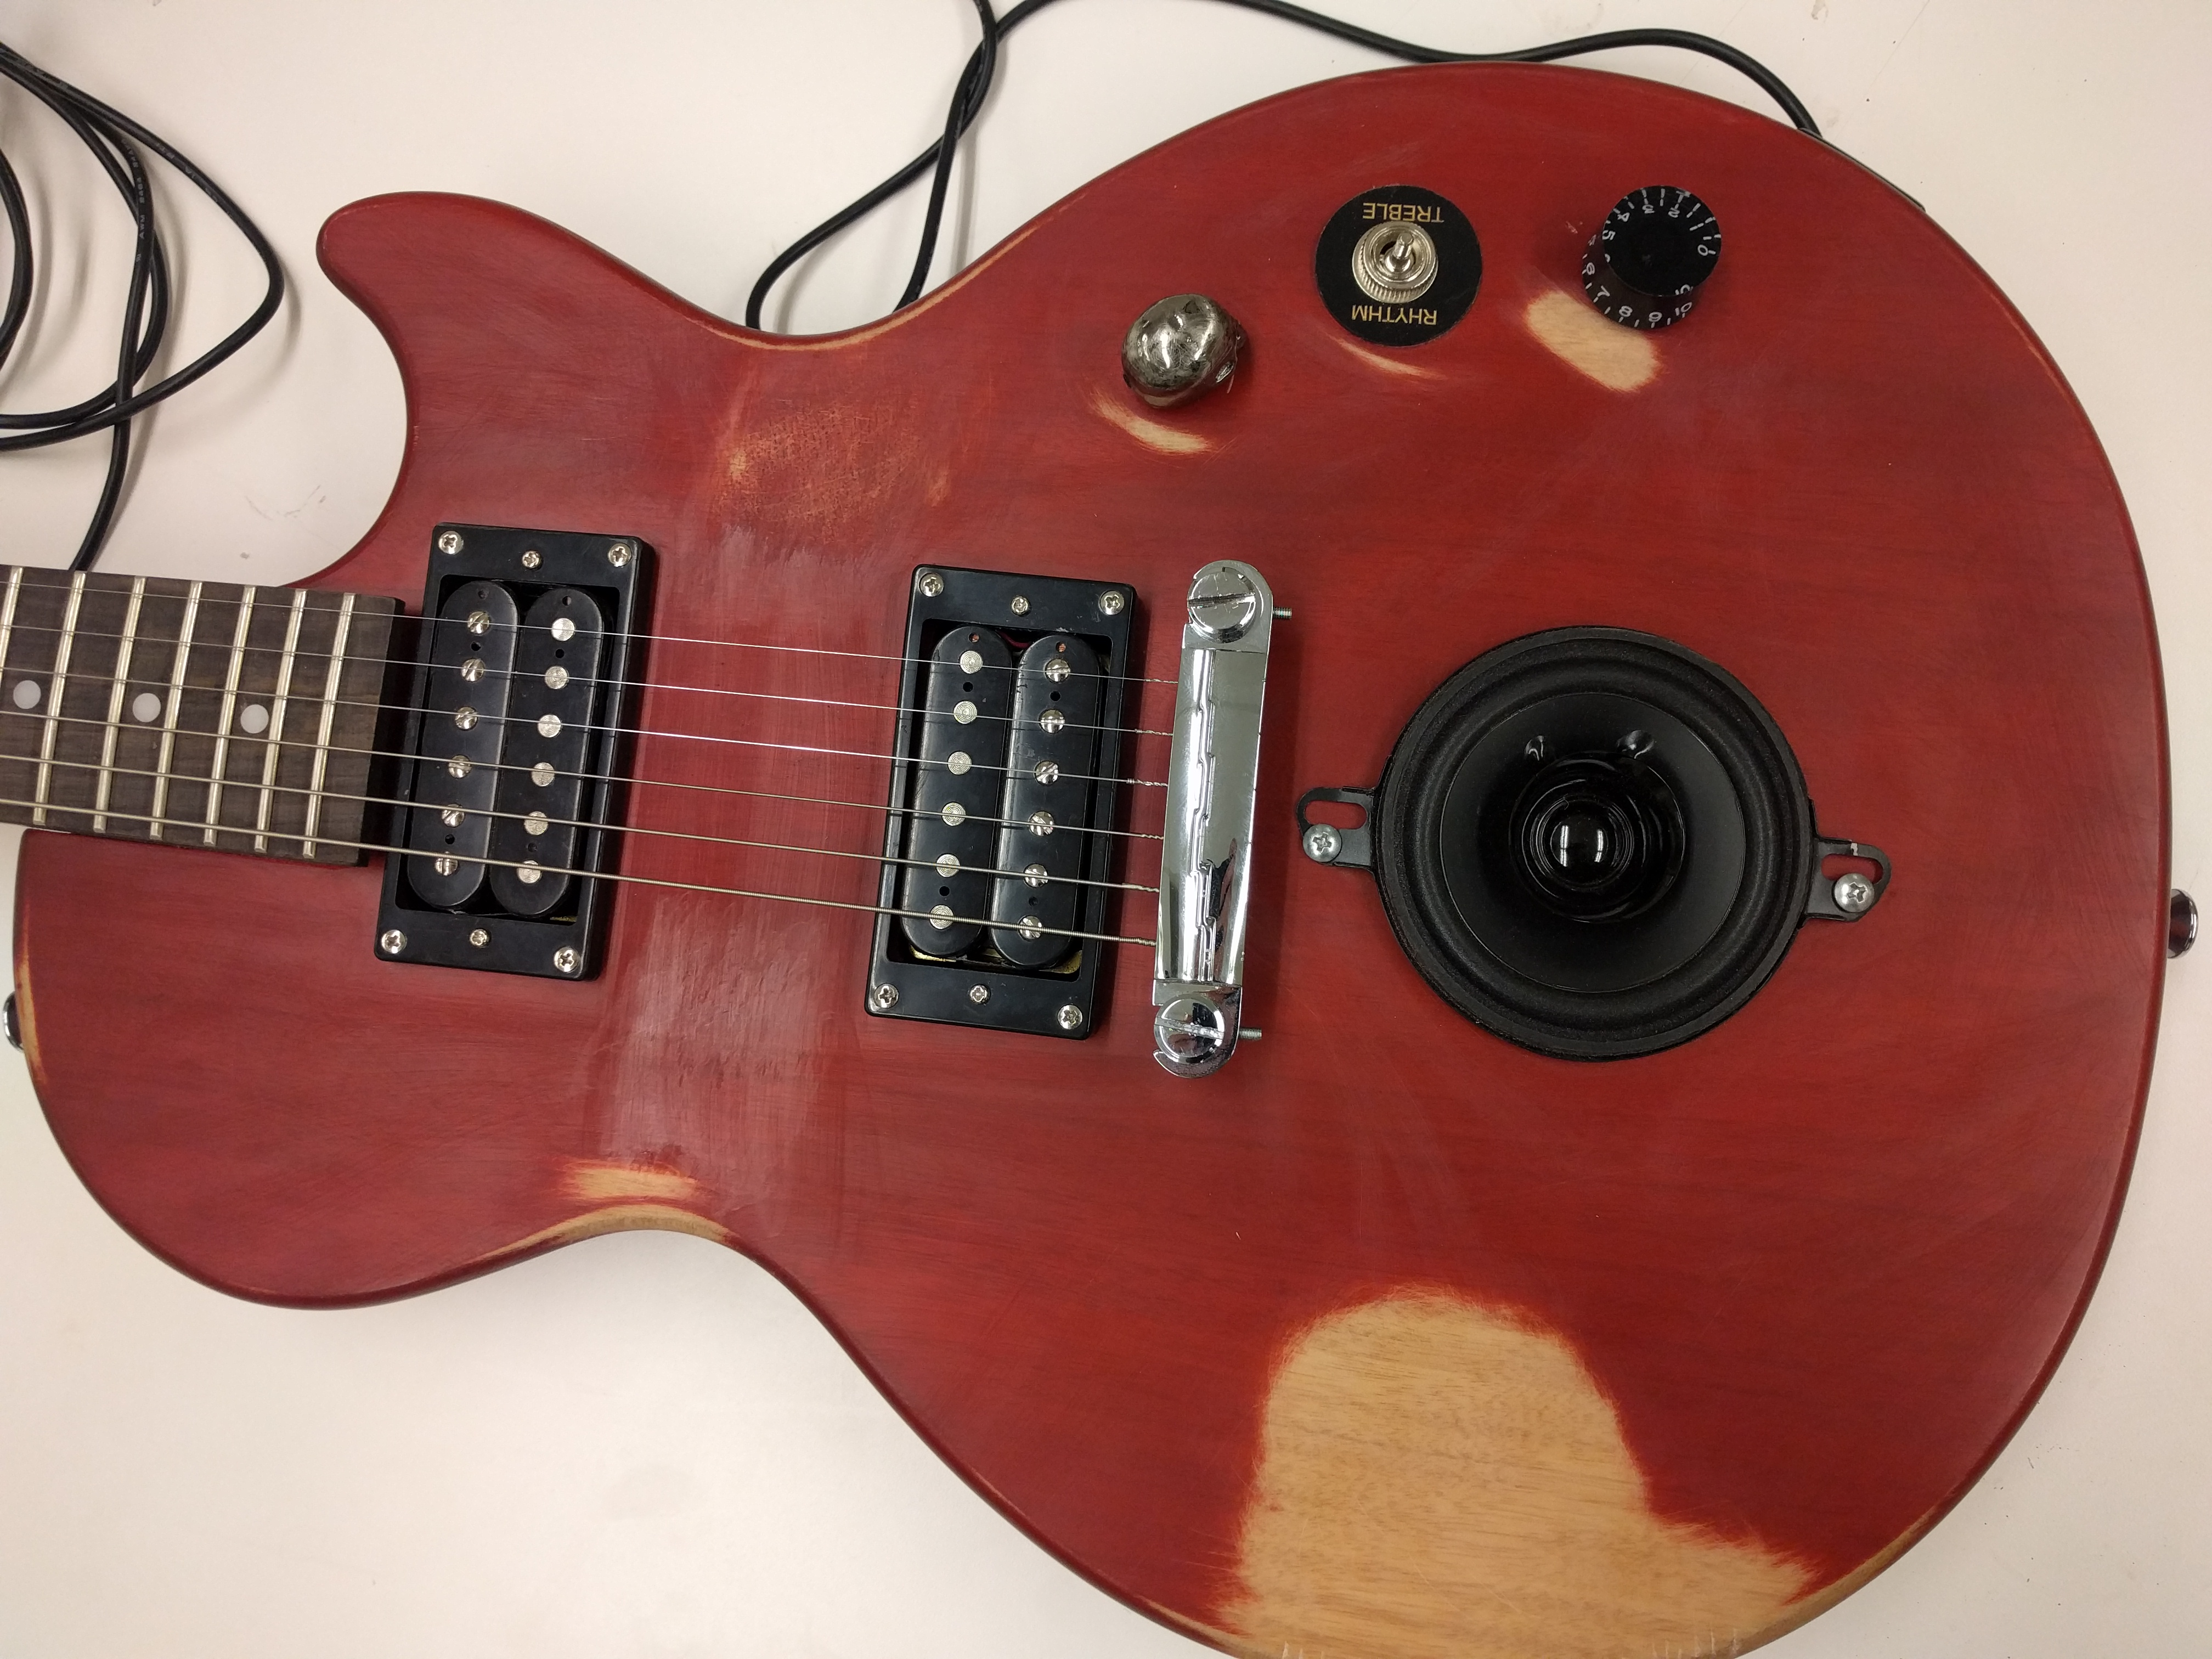 Road Worn Speaker Guitar By Ethan Gehring